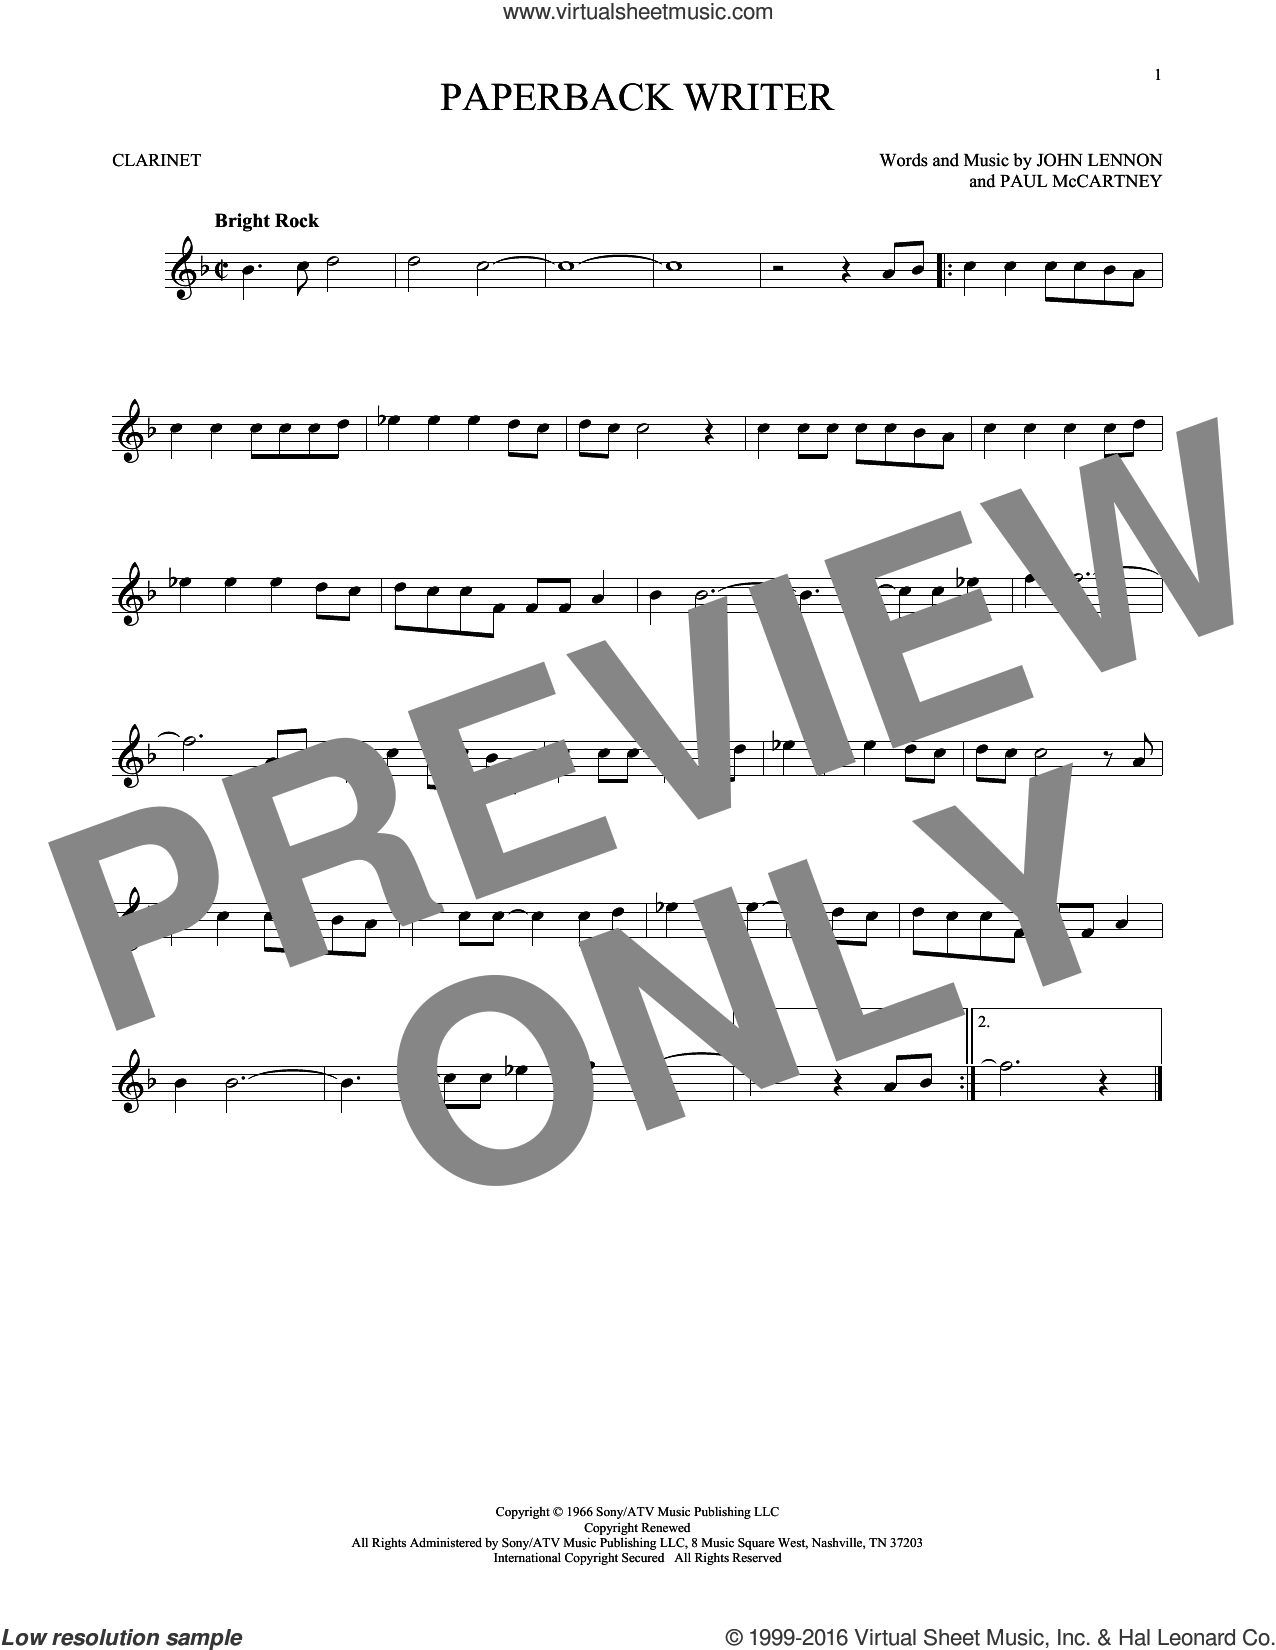 Paperback Writer sheet music for clarinet solo by The Beatles, John Lennon and Paul McCartney, intermediate skill level